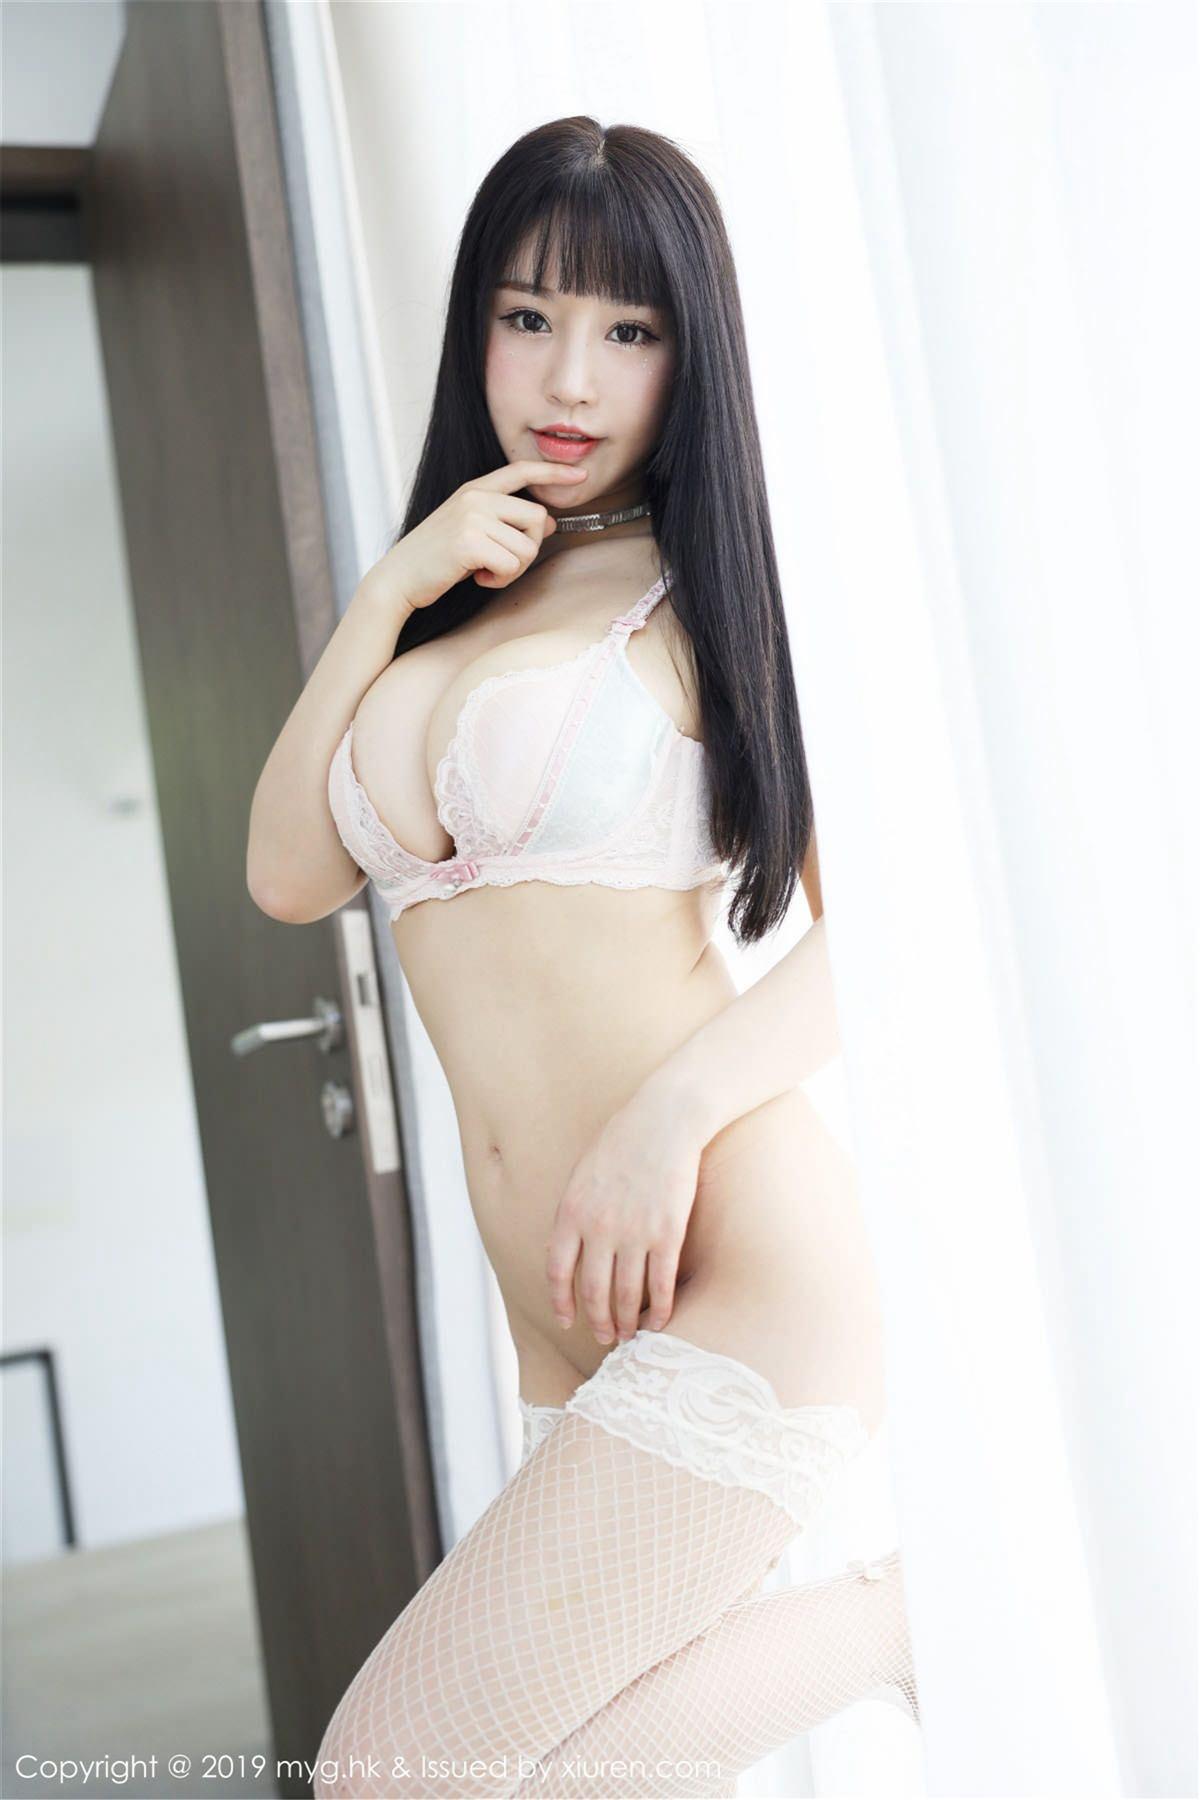 MyGirl Vol.364 20P, mygirl, Zhu Ke Er